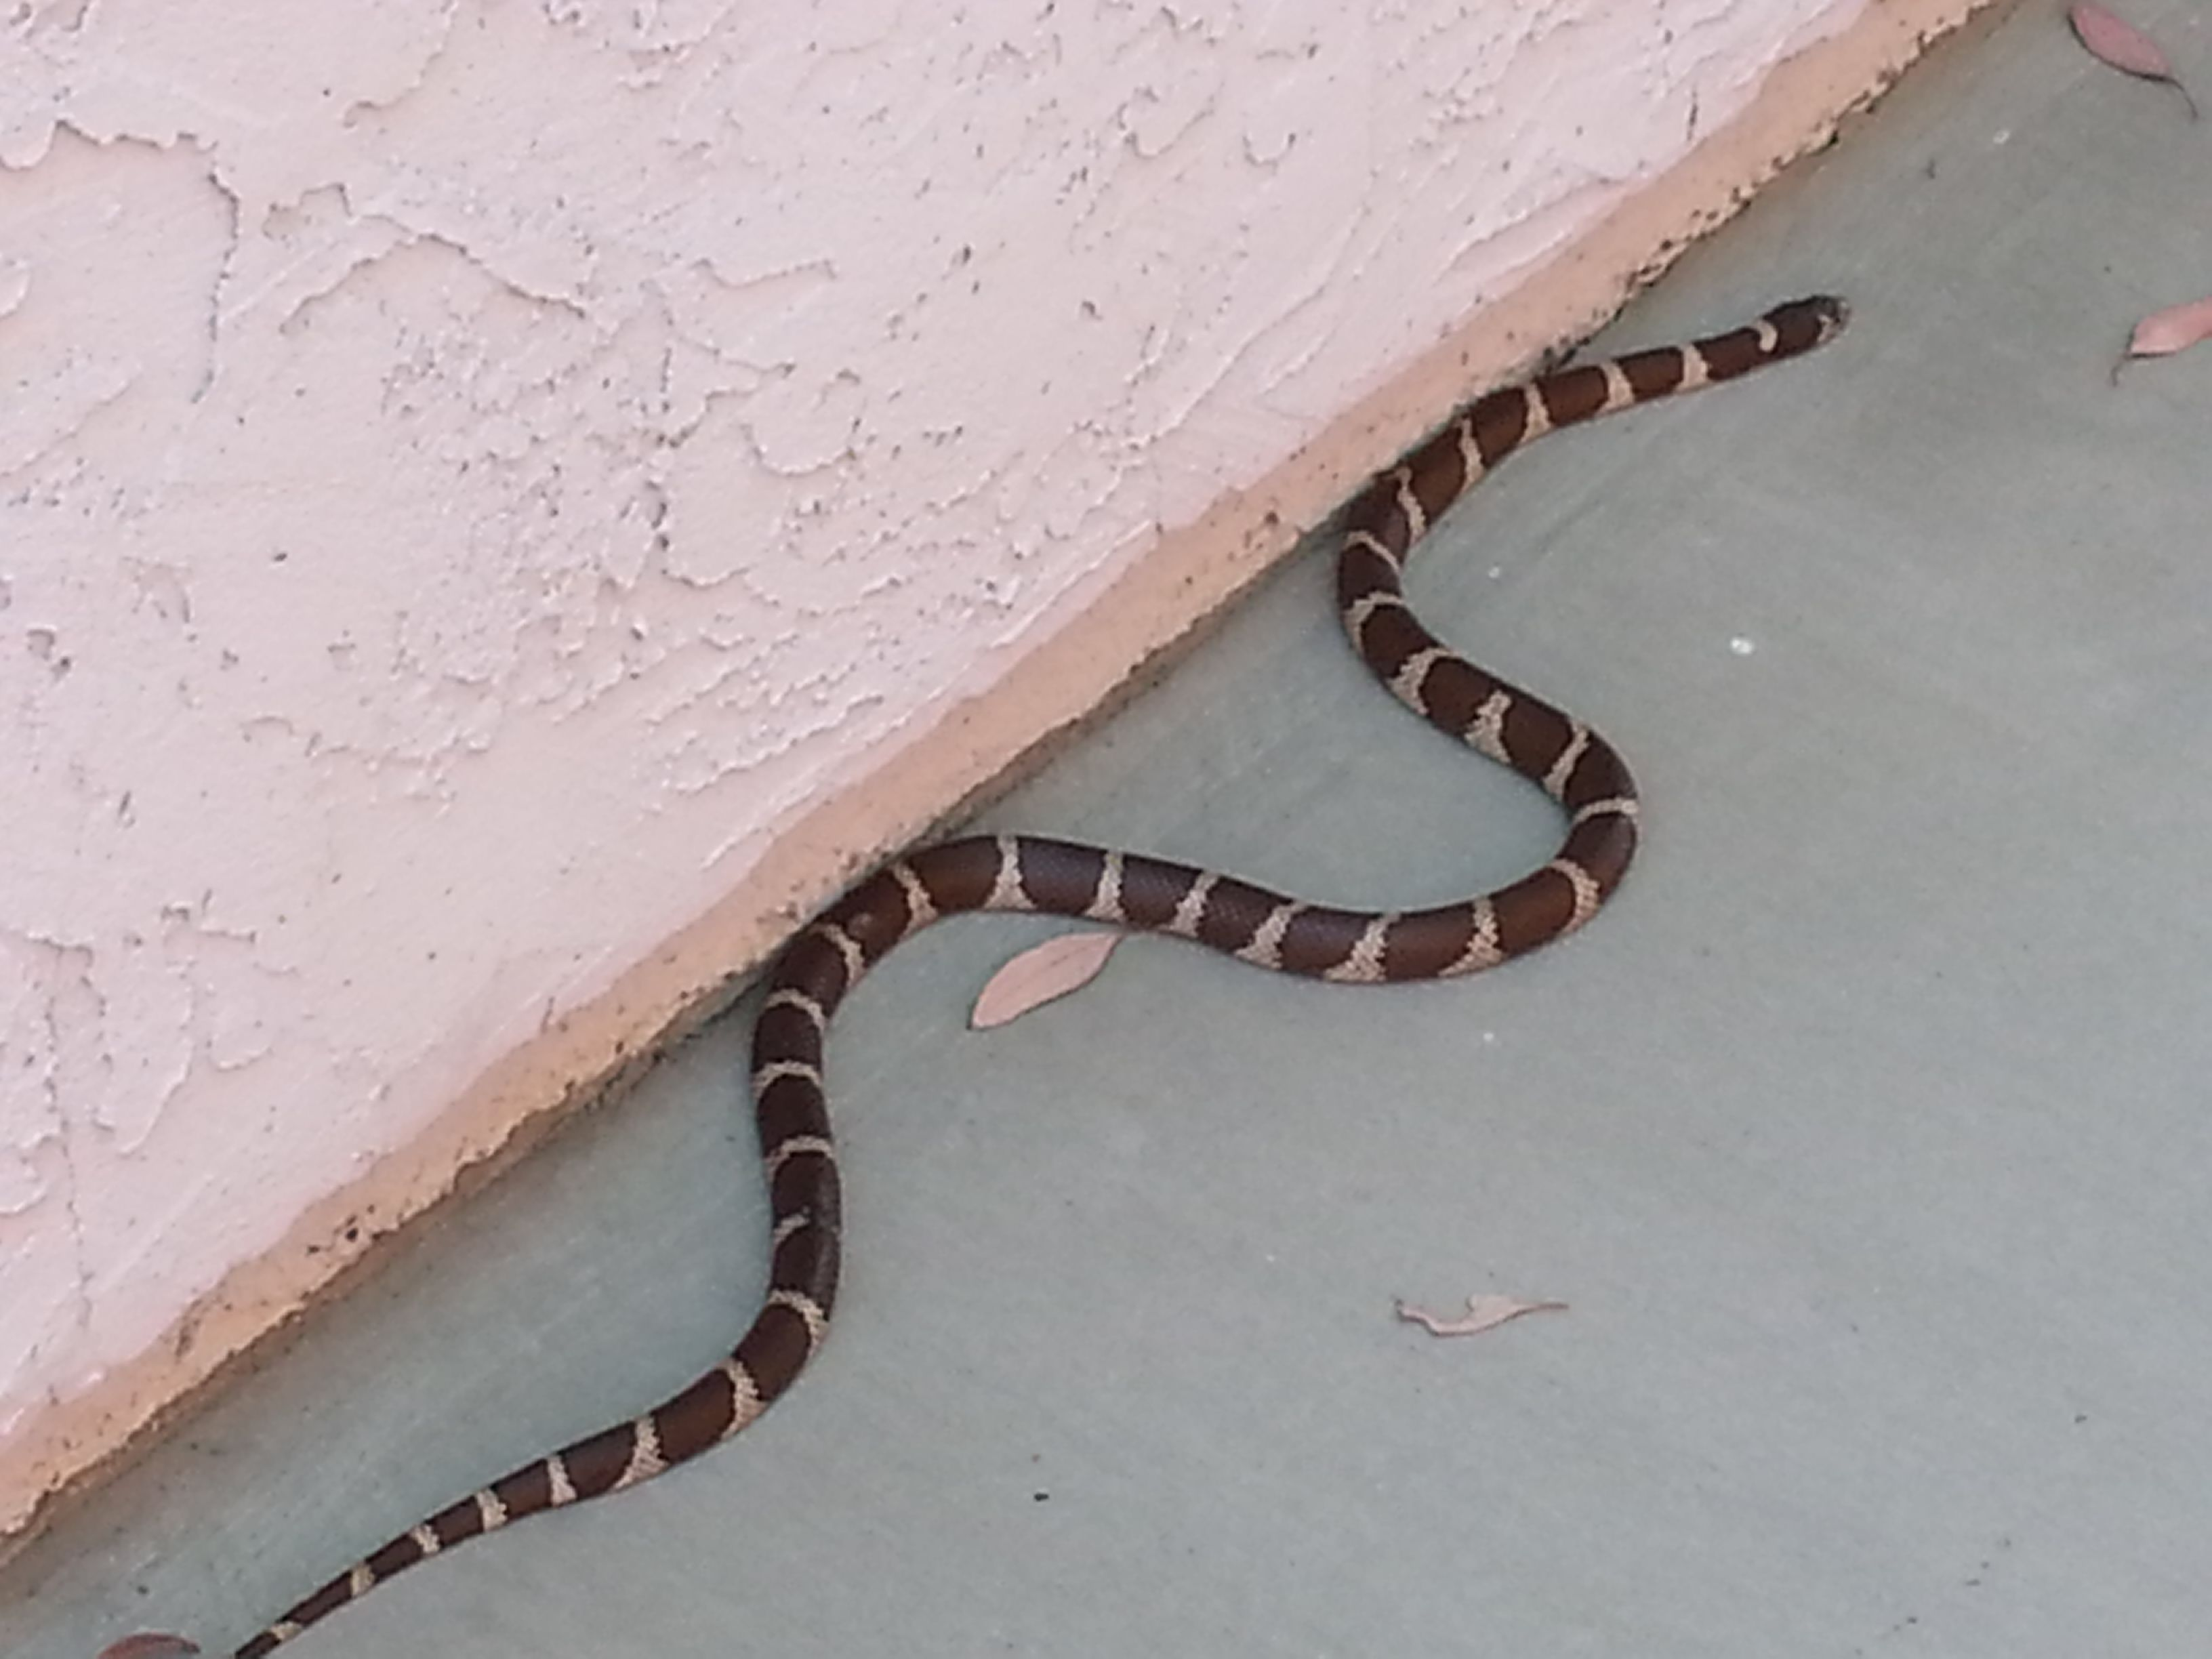 california king snake in our backyard wildlife around san diego